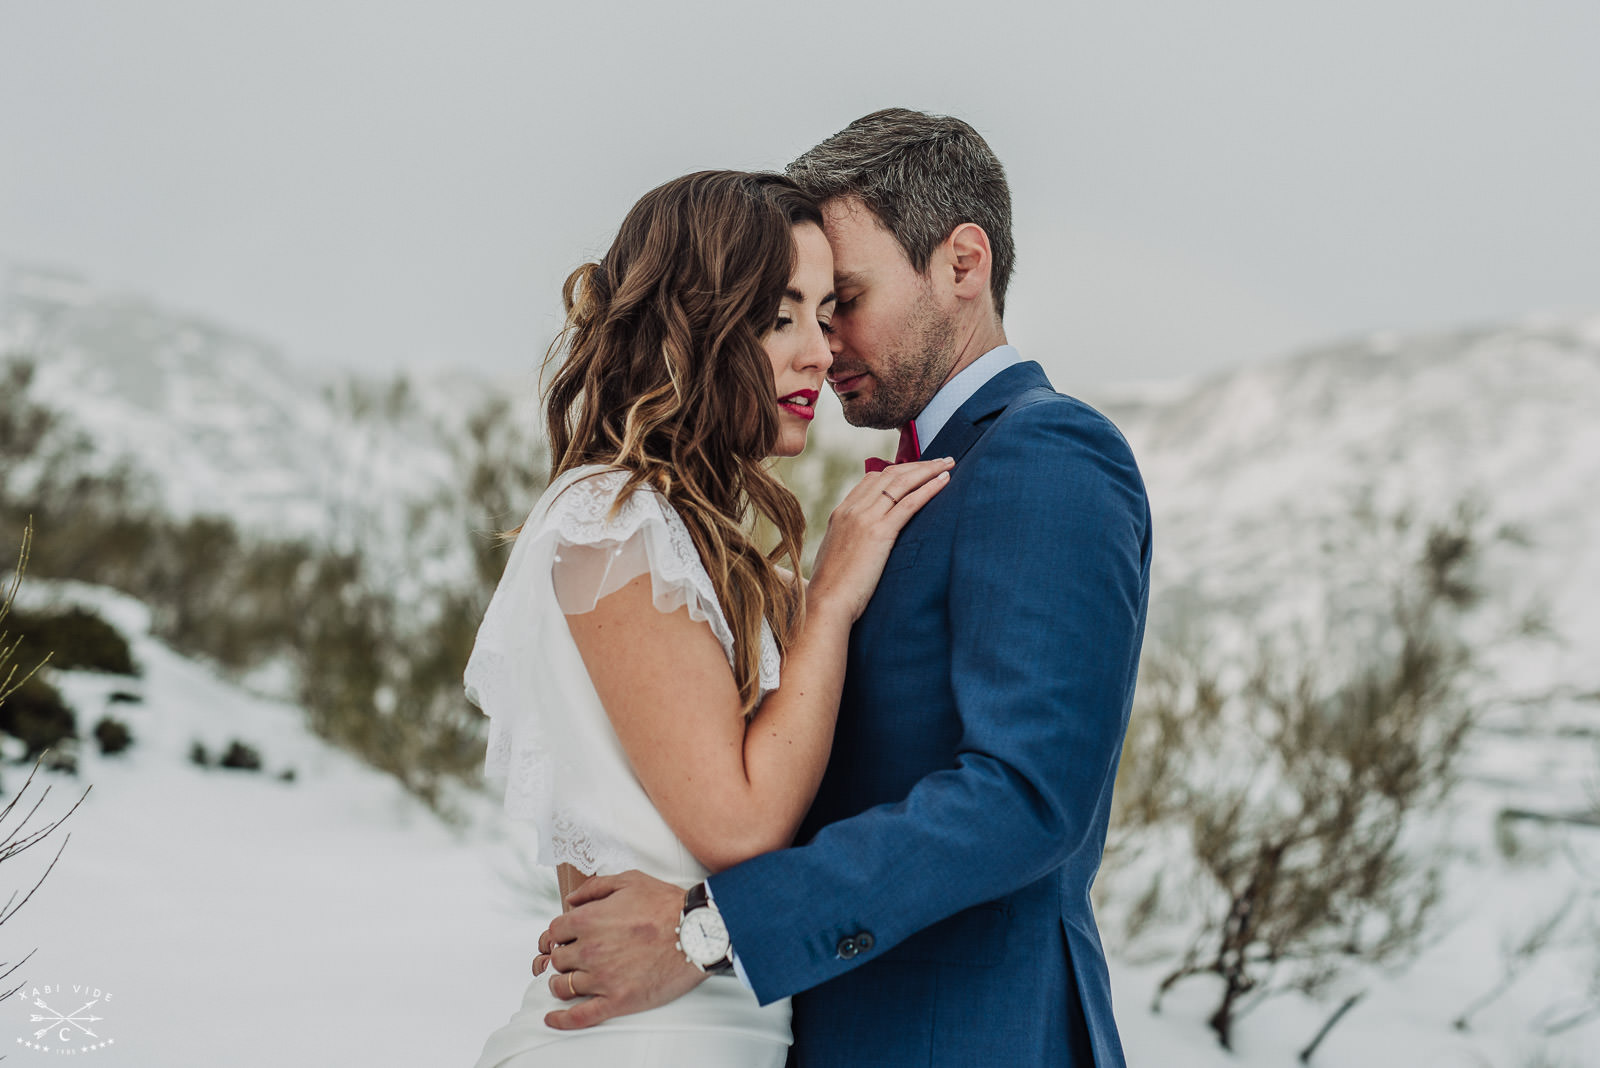 fotógrafo de bodas en bilbao-12